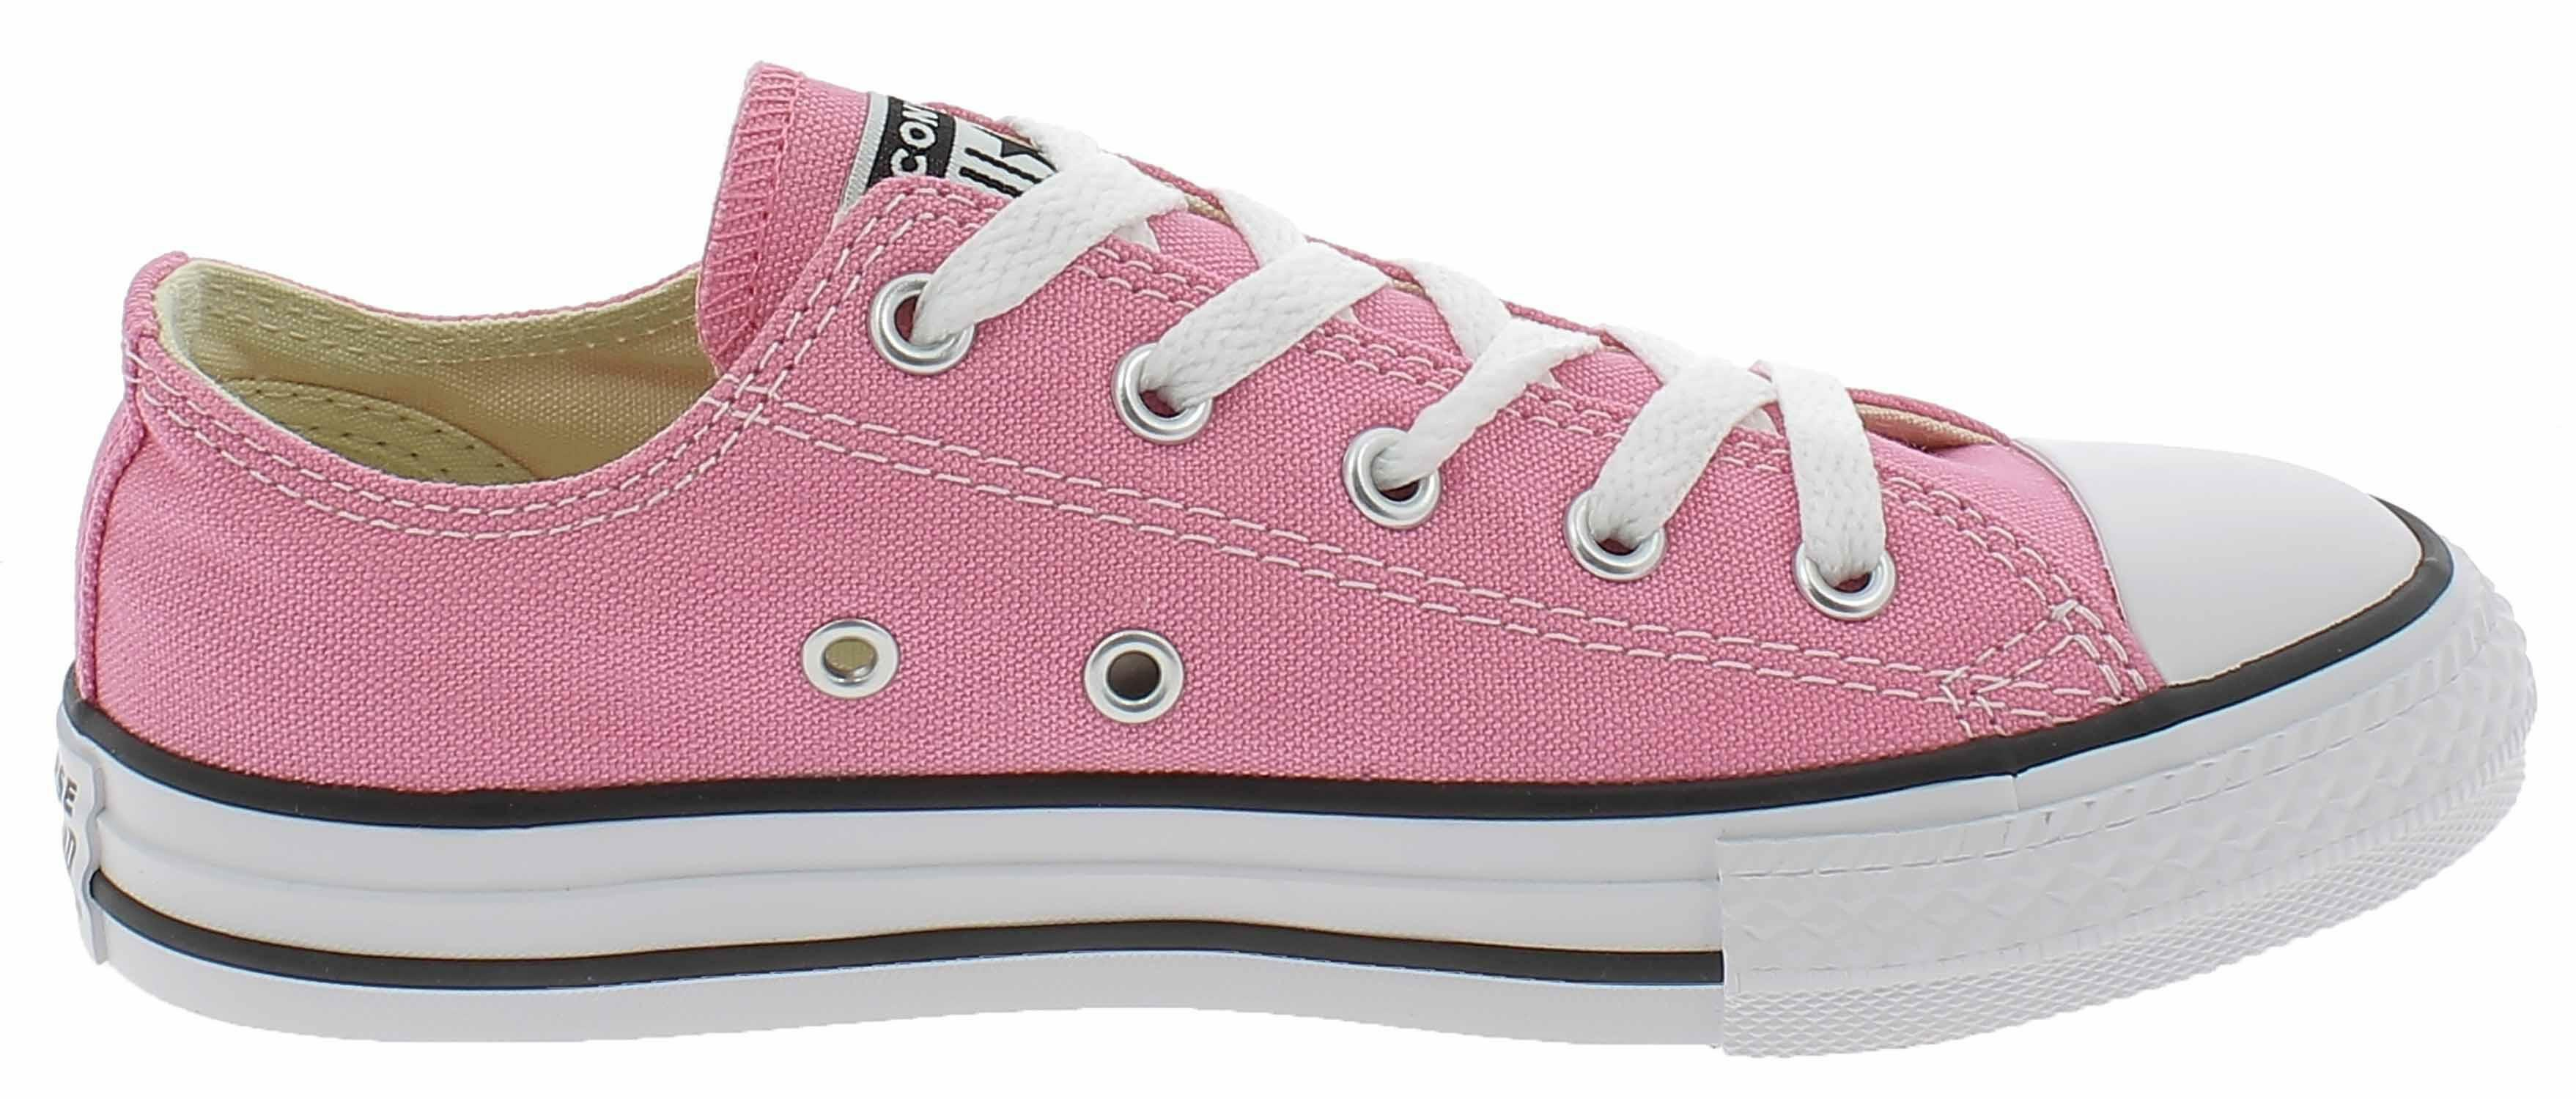 converse converse all star ct scarpe bambina rosa basse 3j238